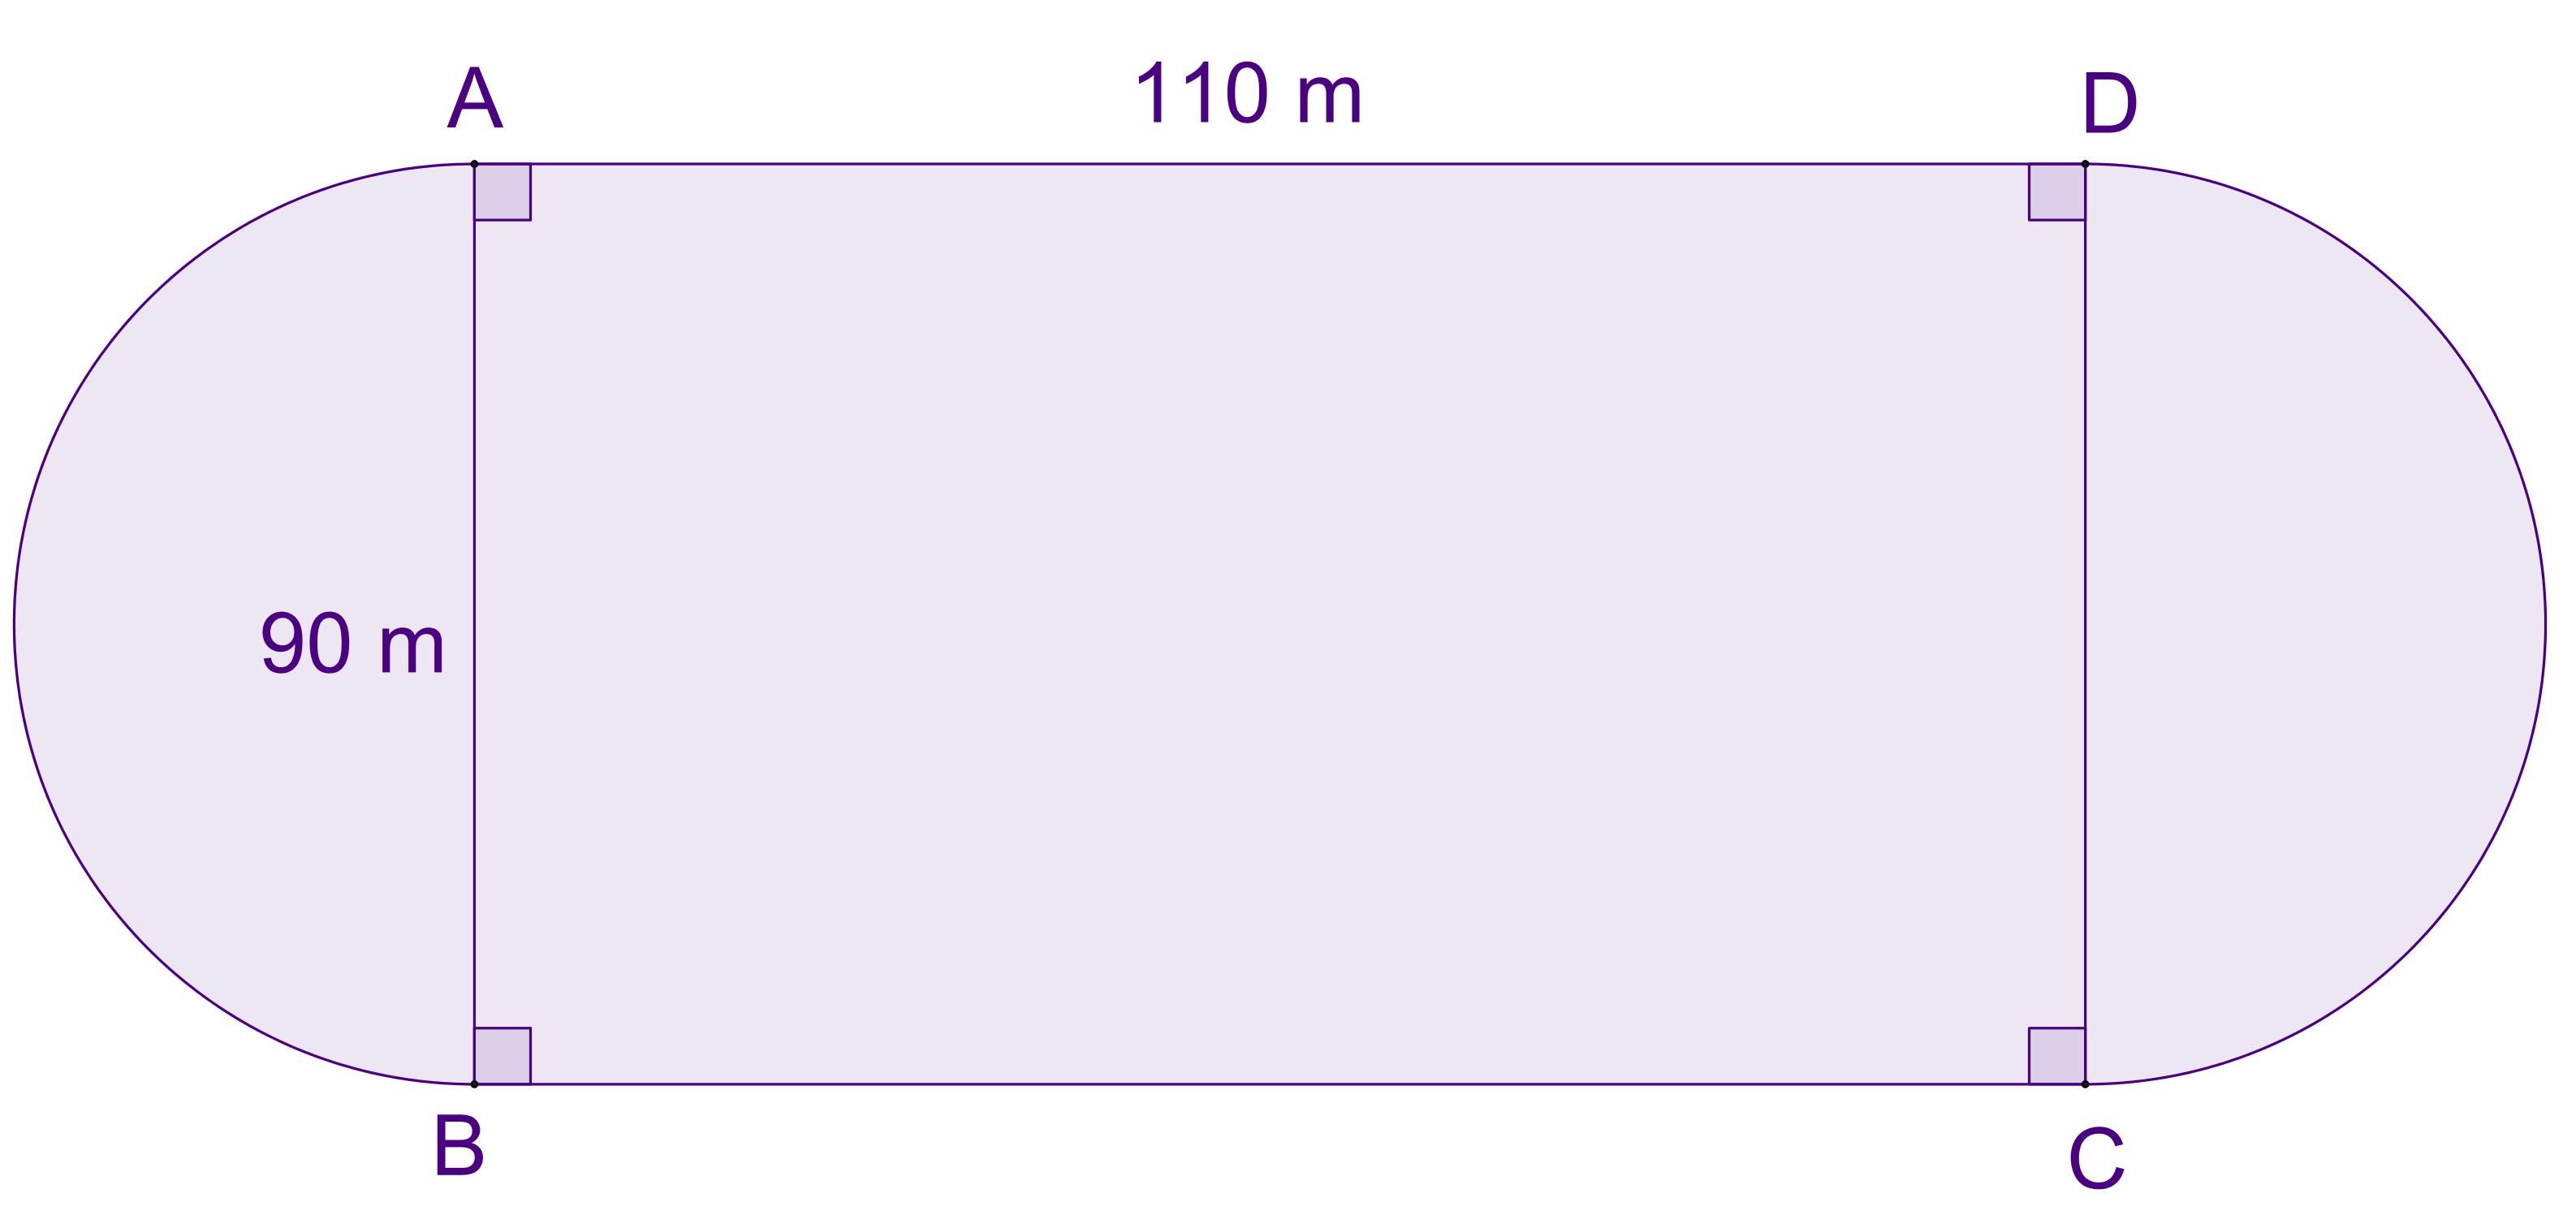 Mathplace exercice_5e_perimetre_aire-13-1 Exercice 1 : aire d'une piste d'athlétisme